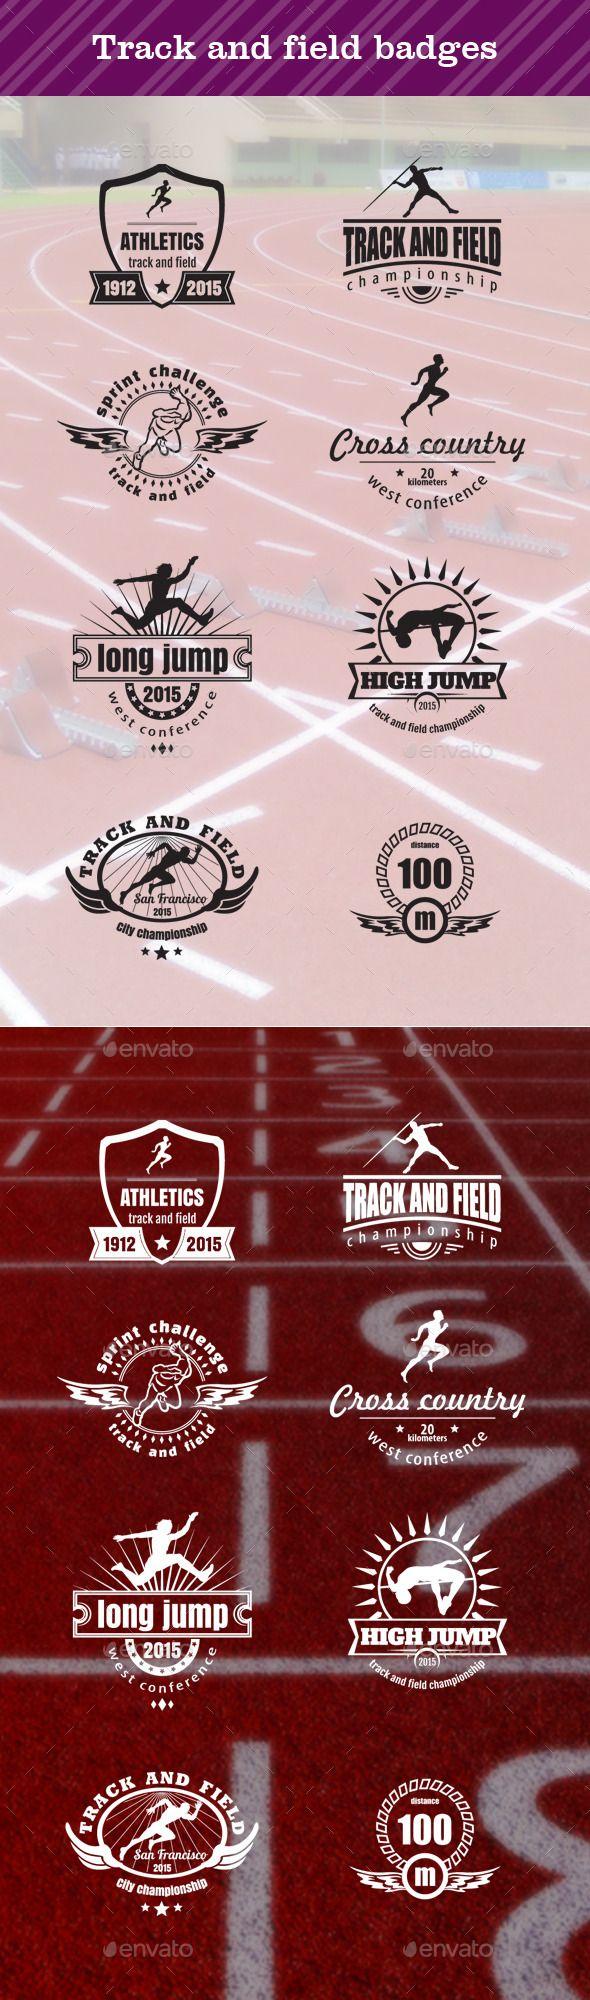 Bulldog track and field logo designs